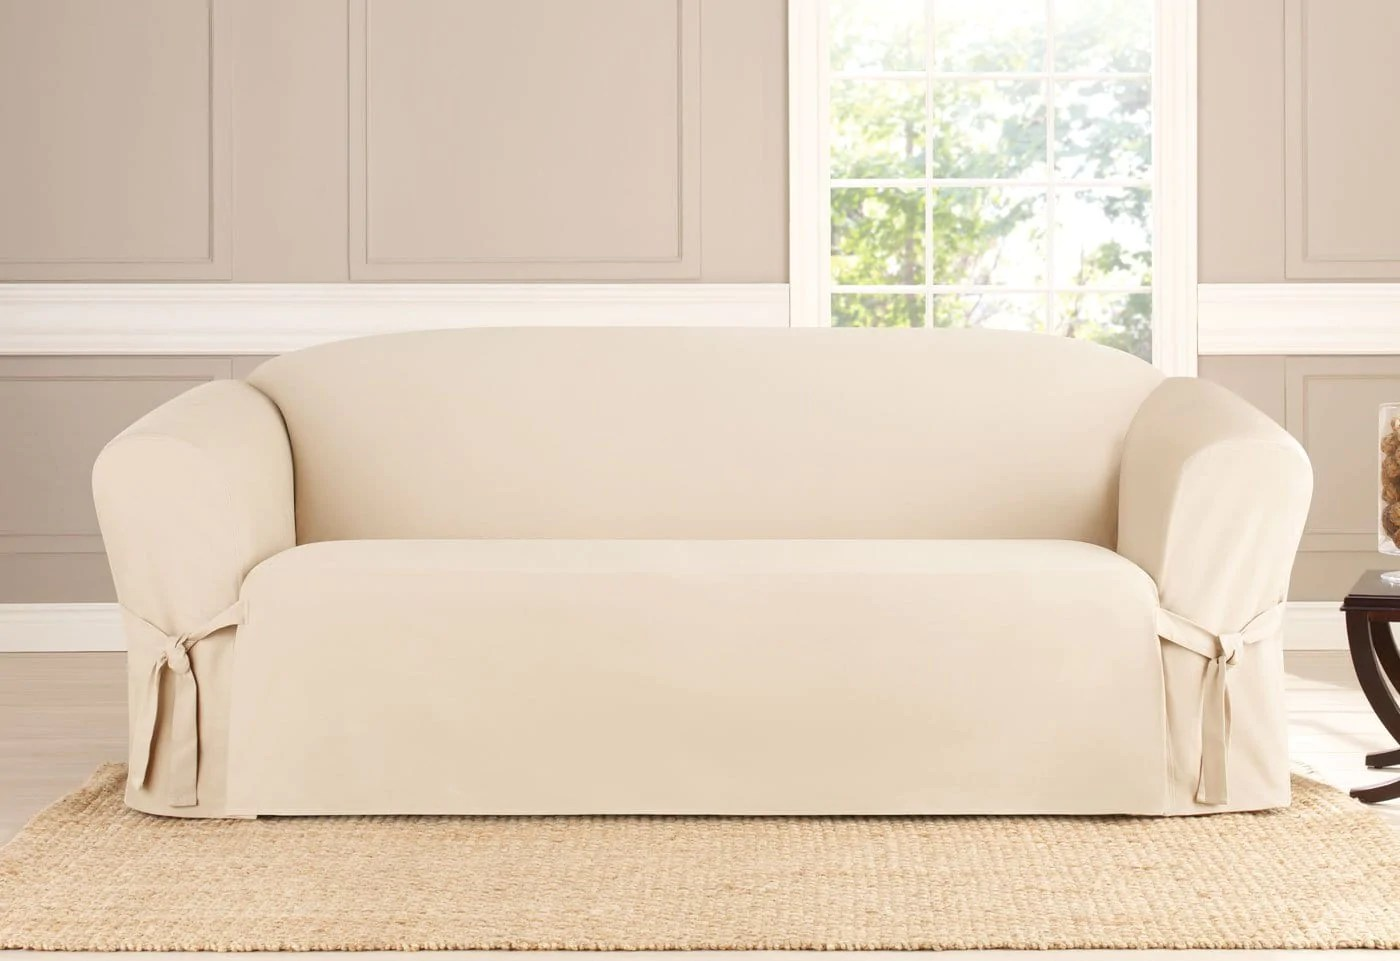 stretch morgan 1 piece sofa furniture cover macy s seafoam heavyweight cotton duck one slipcover surefit